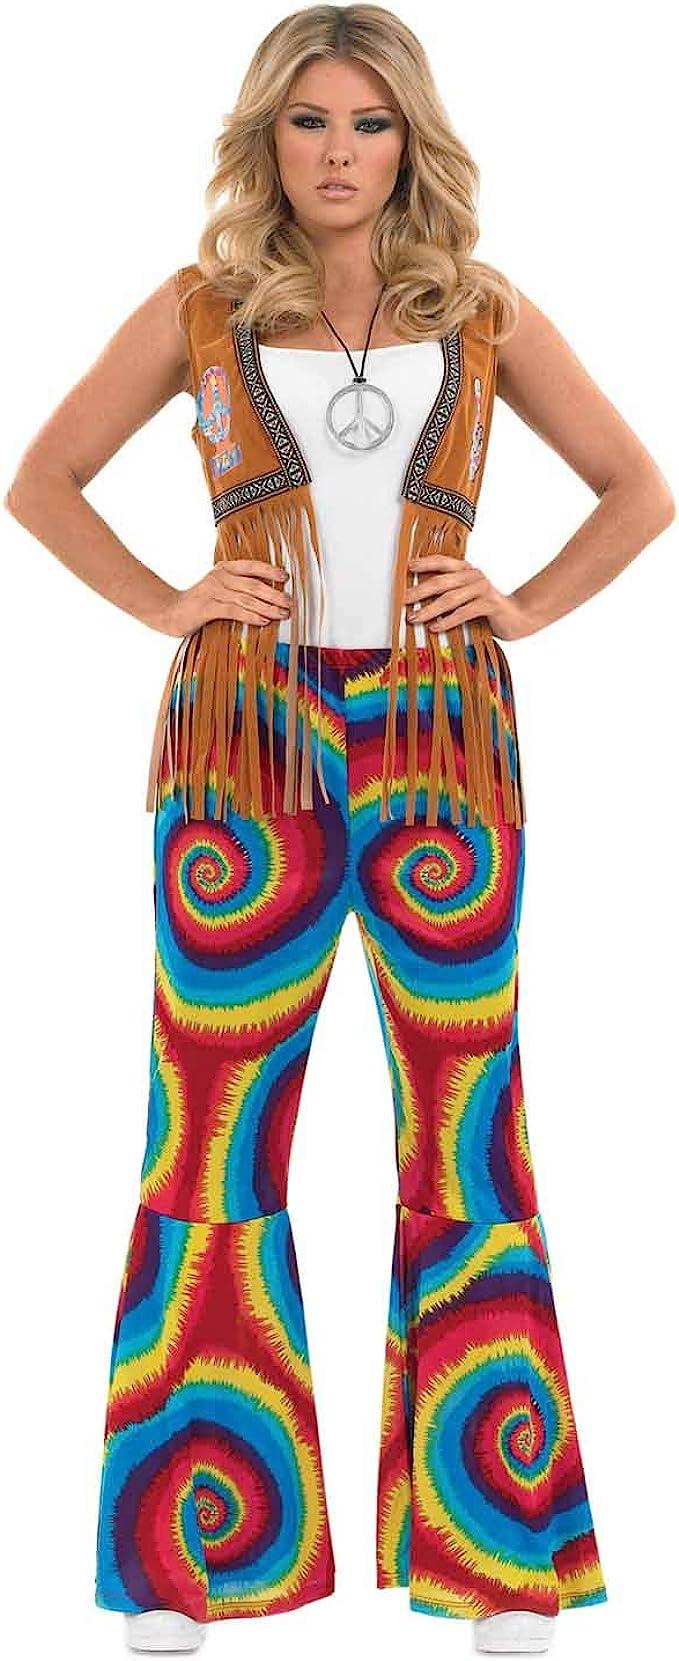 Ladiers Tye Dye Flated Trousers, S to XXL